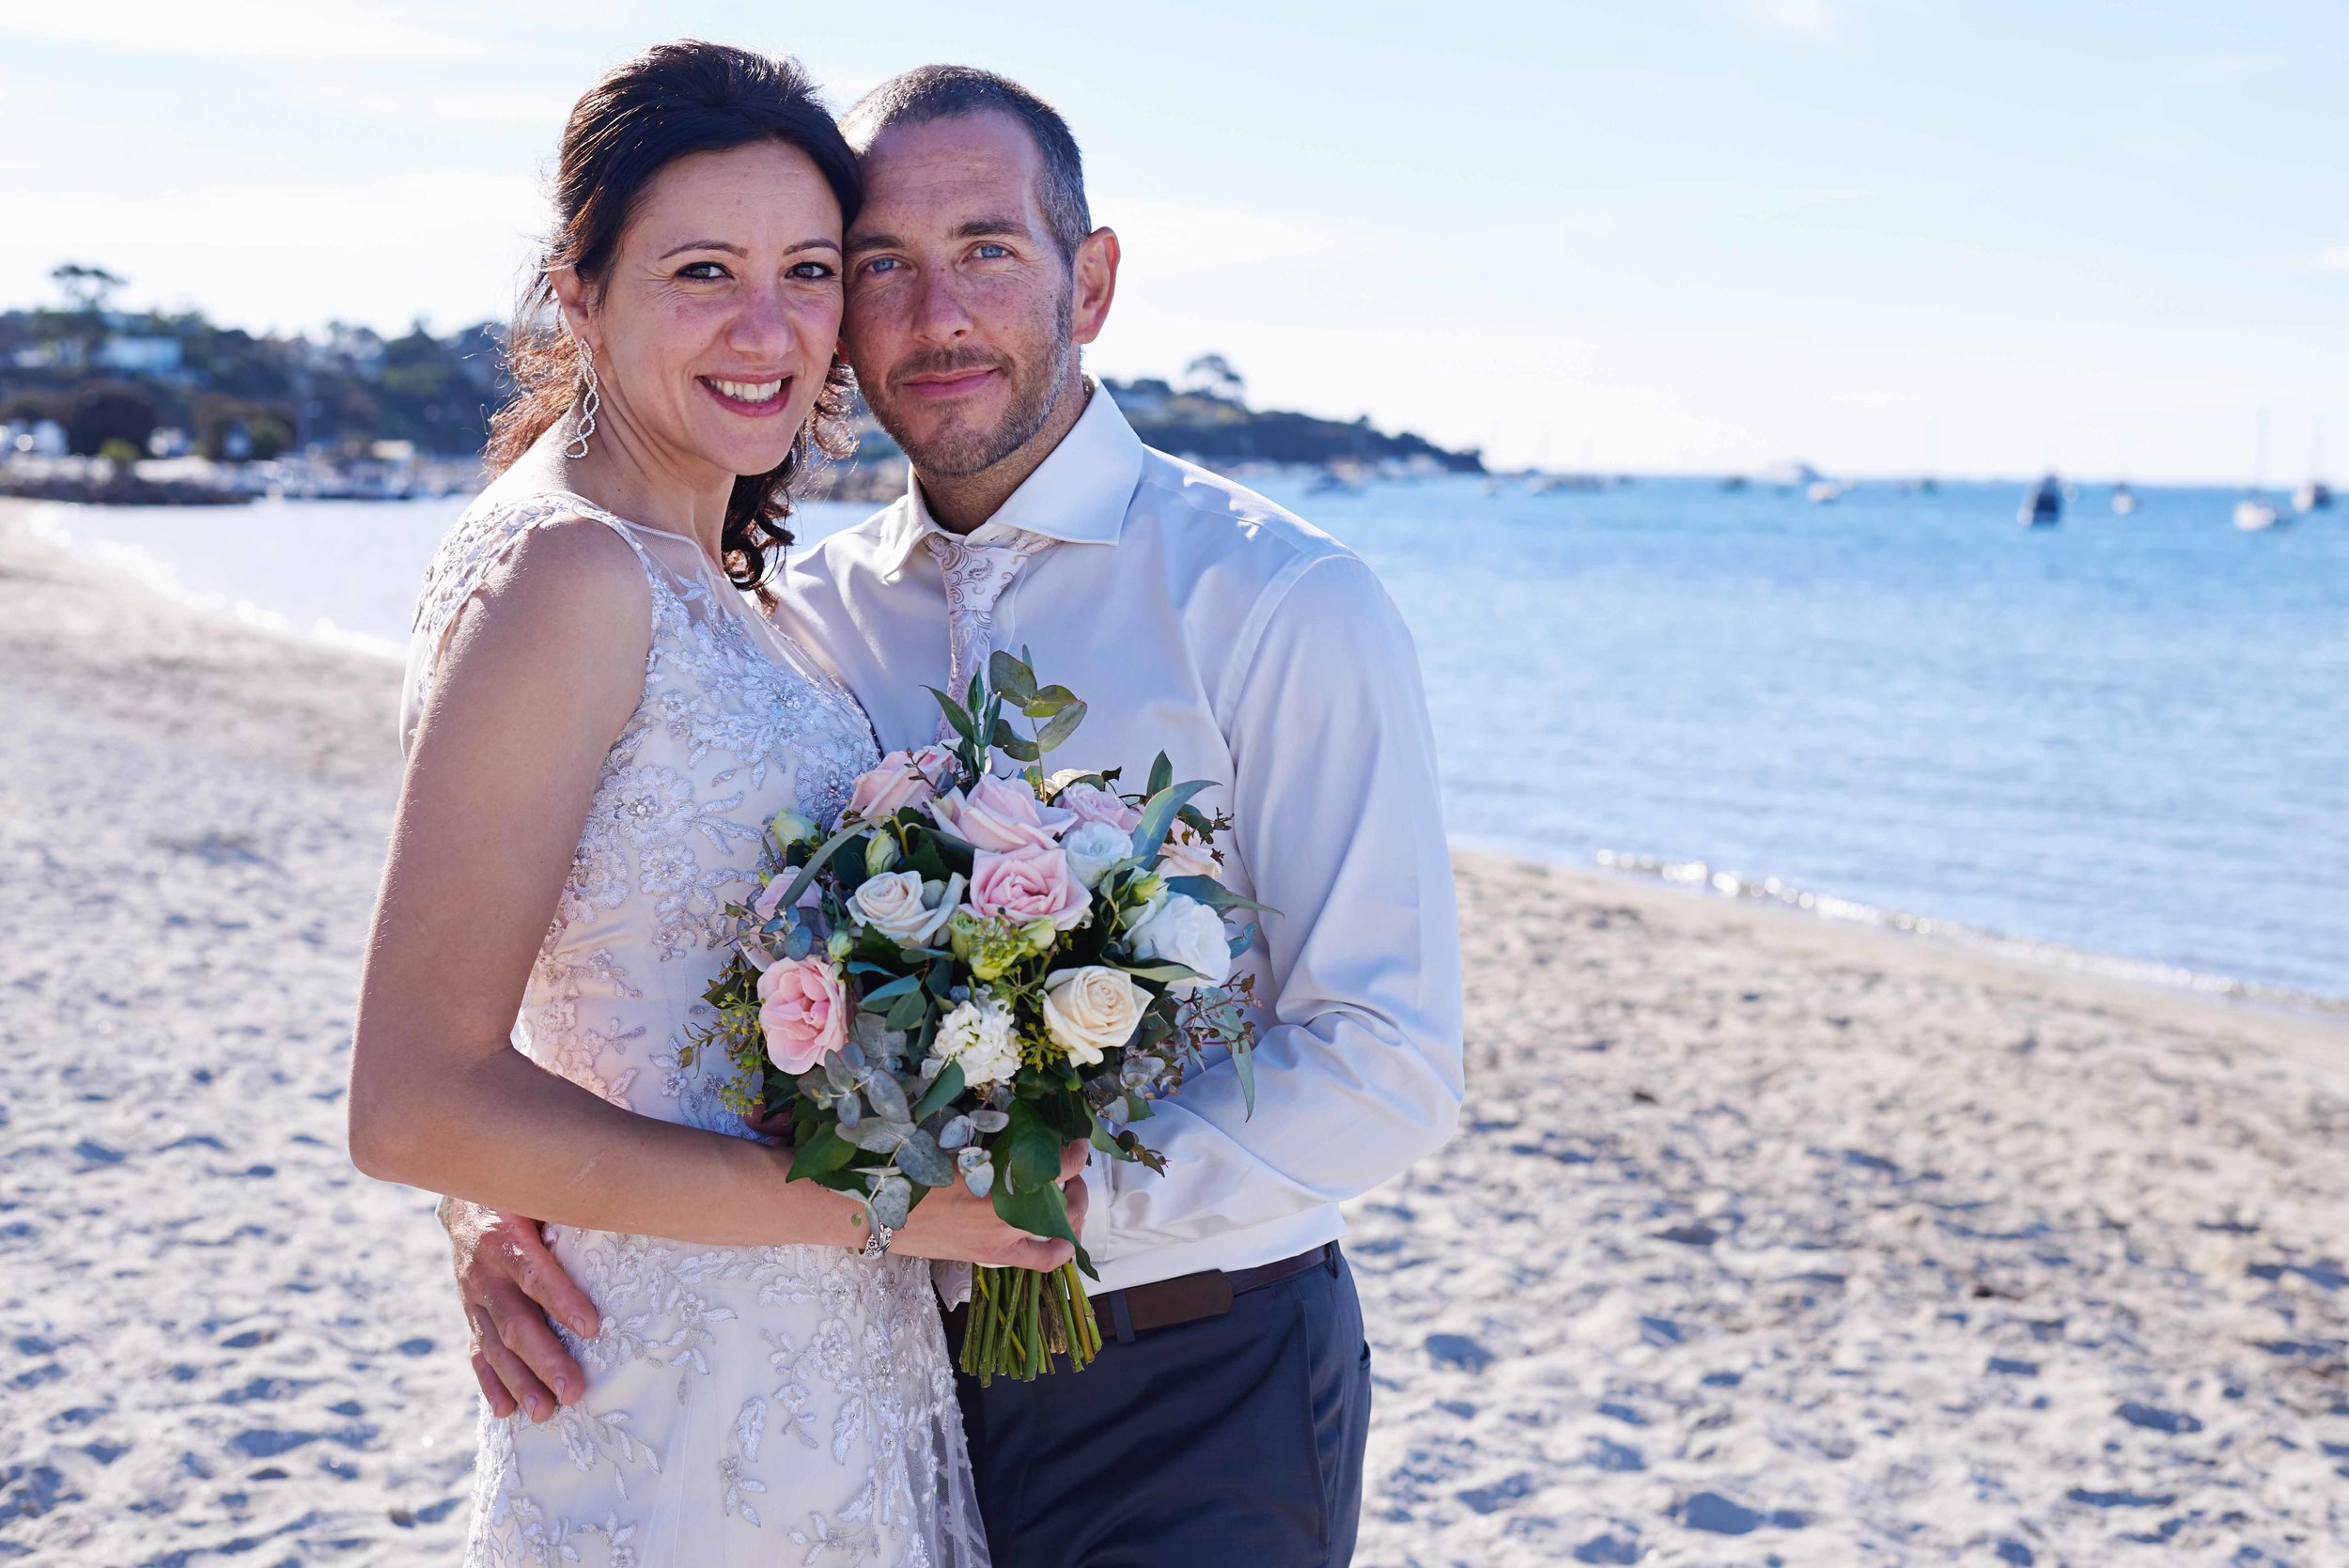 sorrento-wedding-photography-all-smiles-marissa-jade-photography-161.jpg